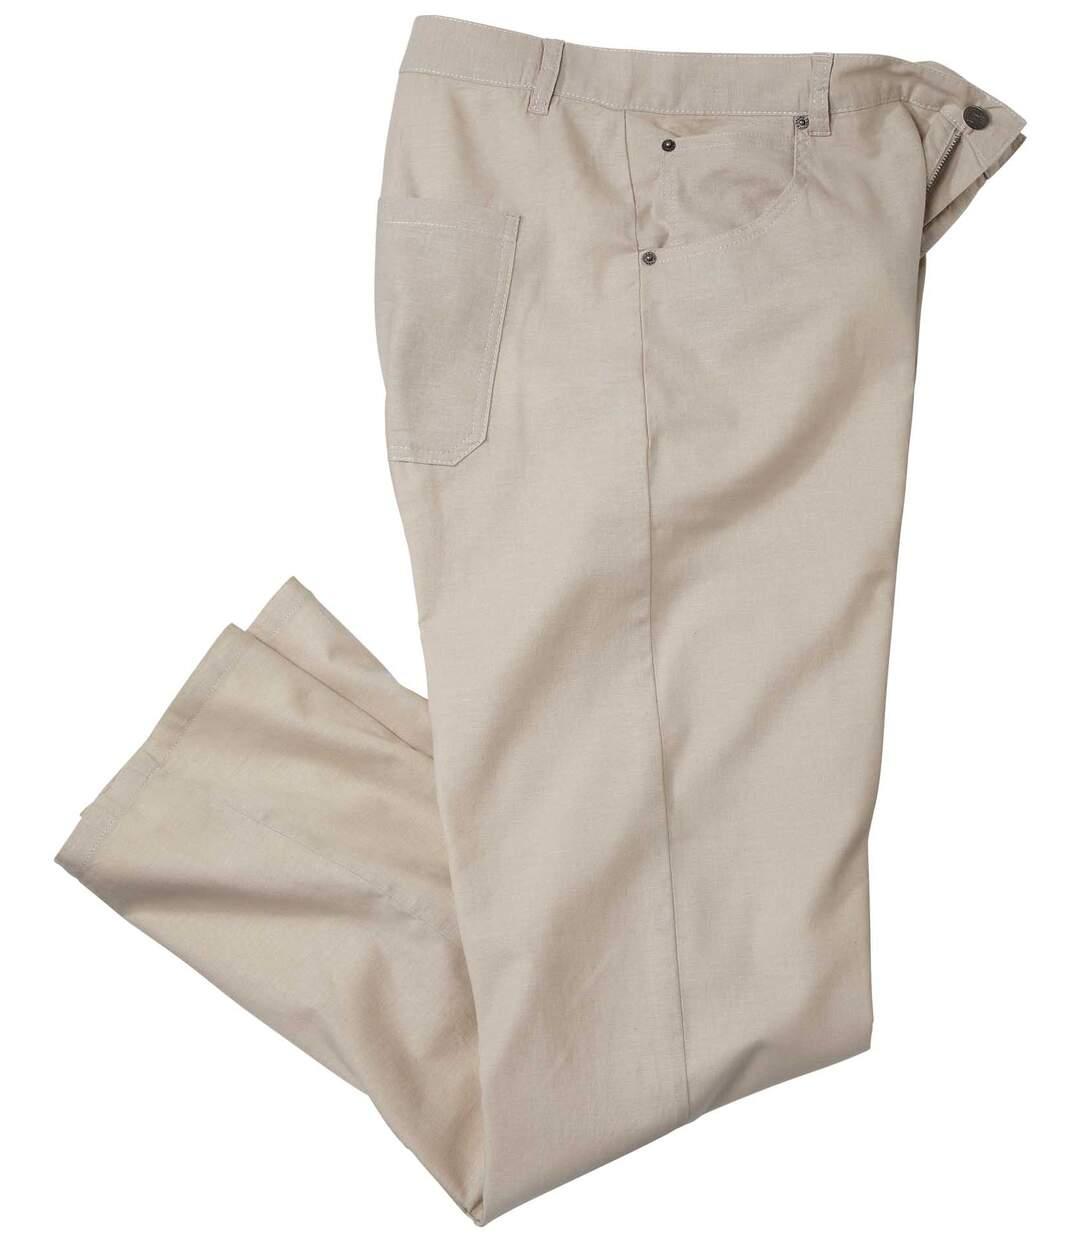 Pantalon Stretch Coton/Lin Beige